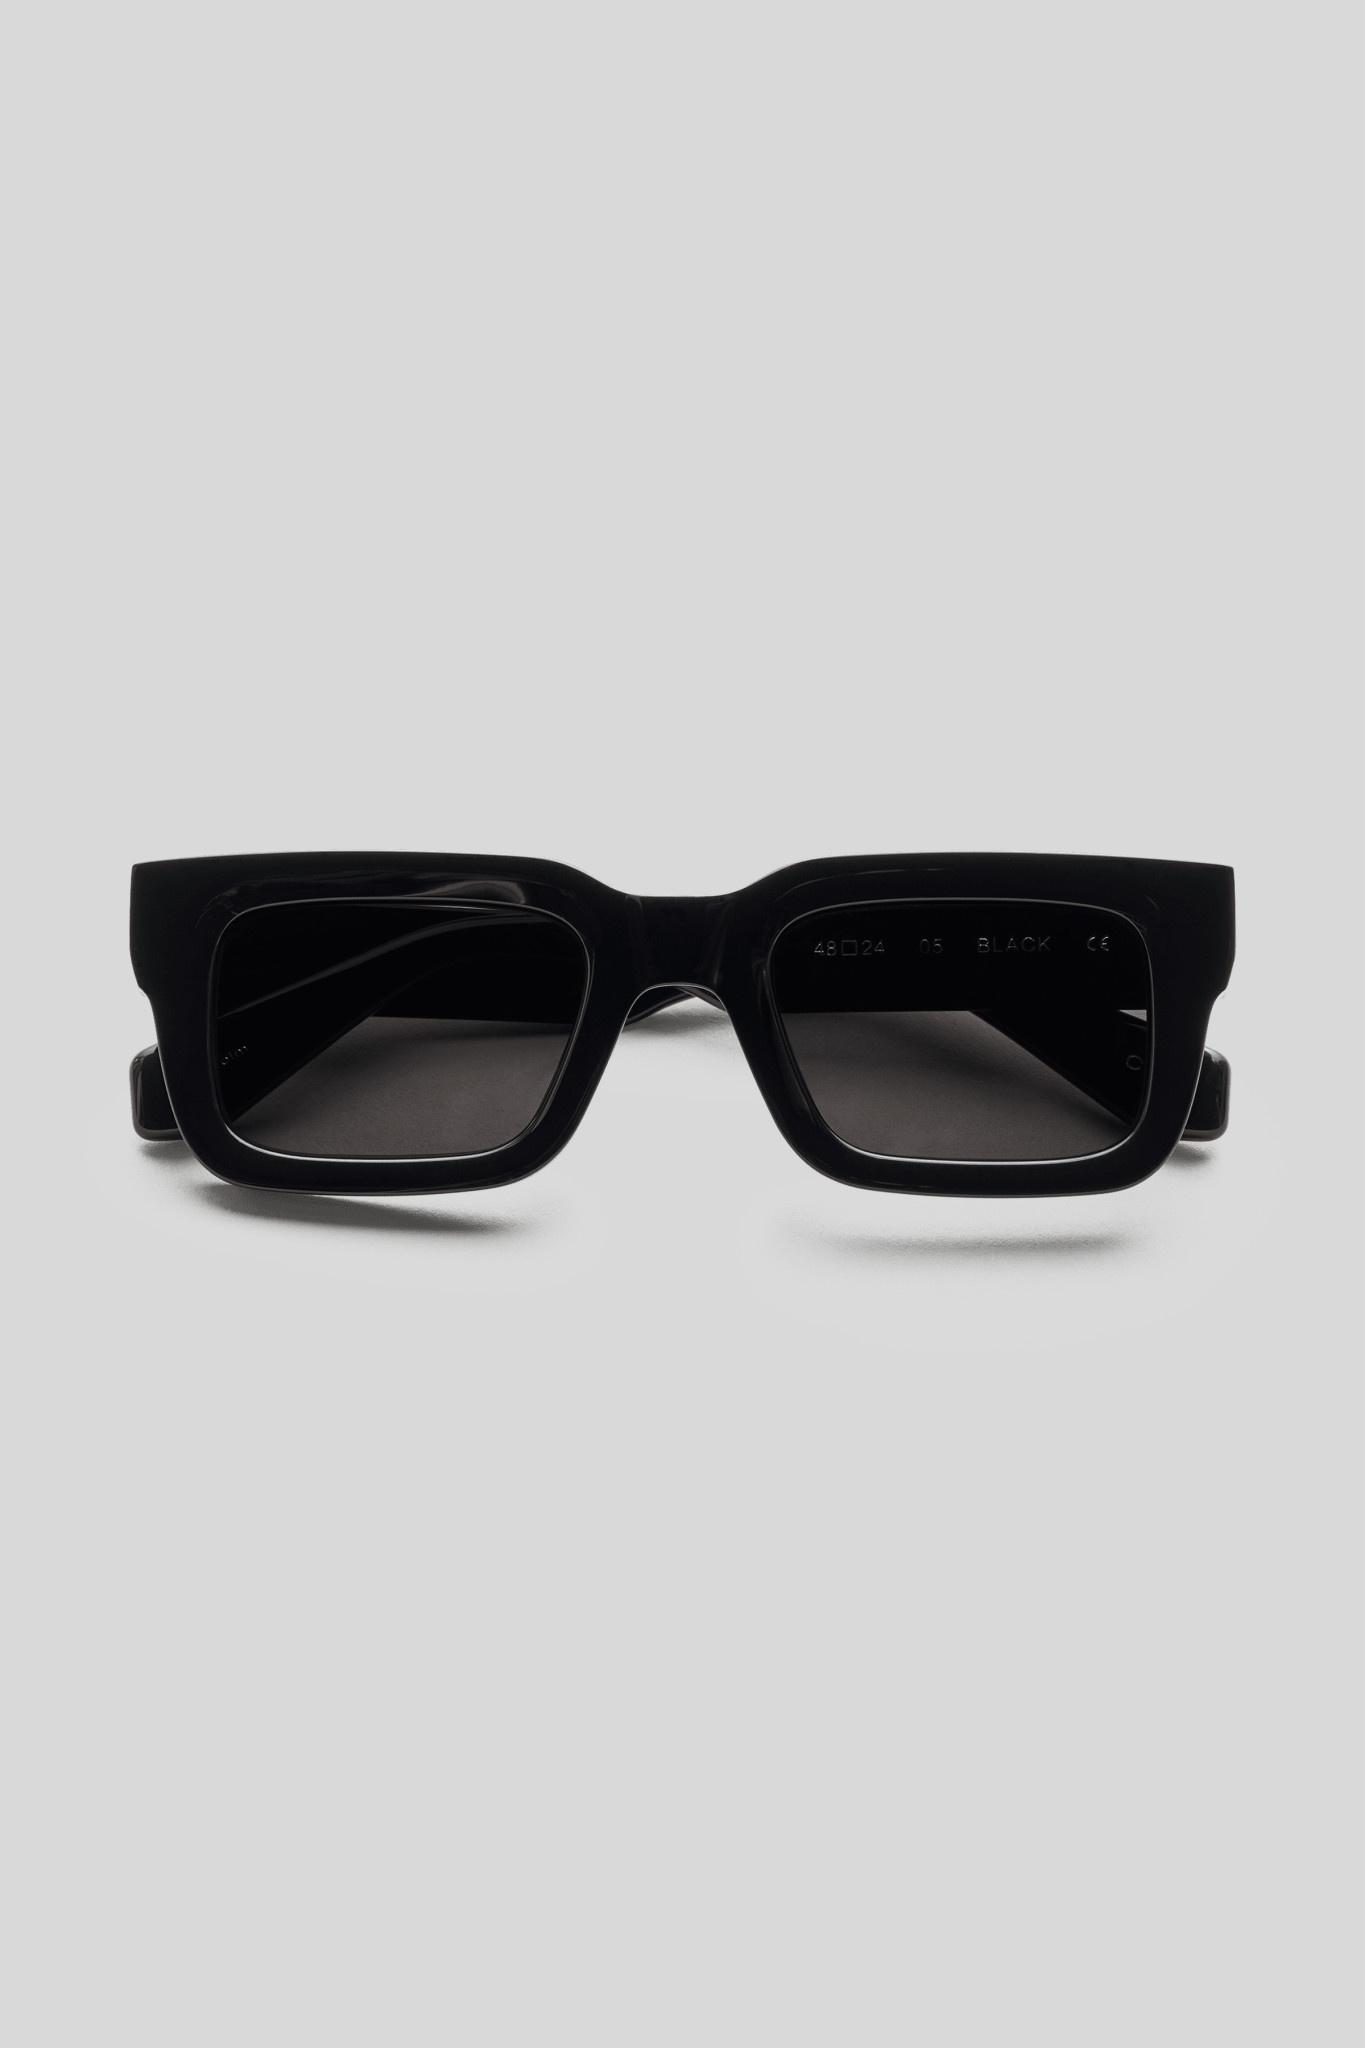 Sunglasses 05 - Black-1